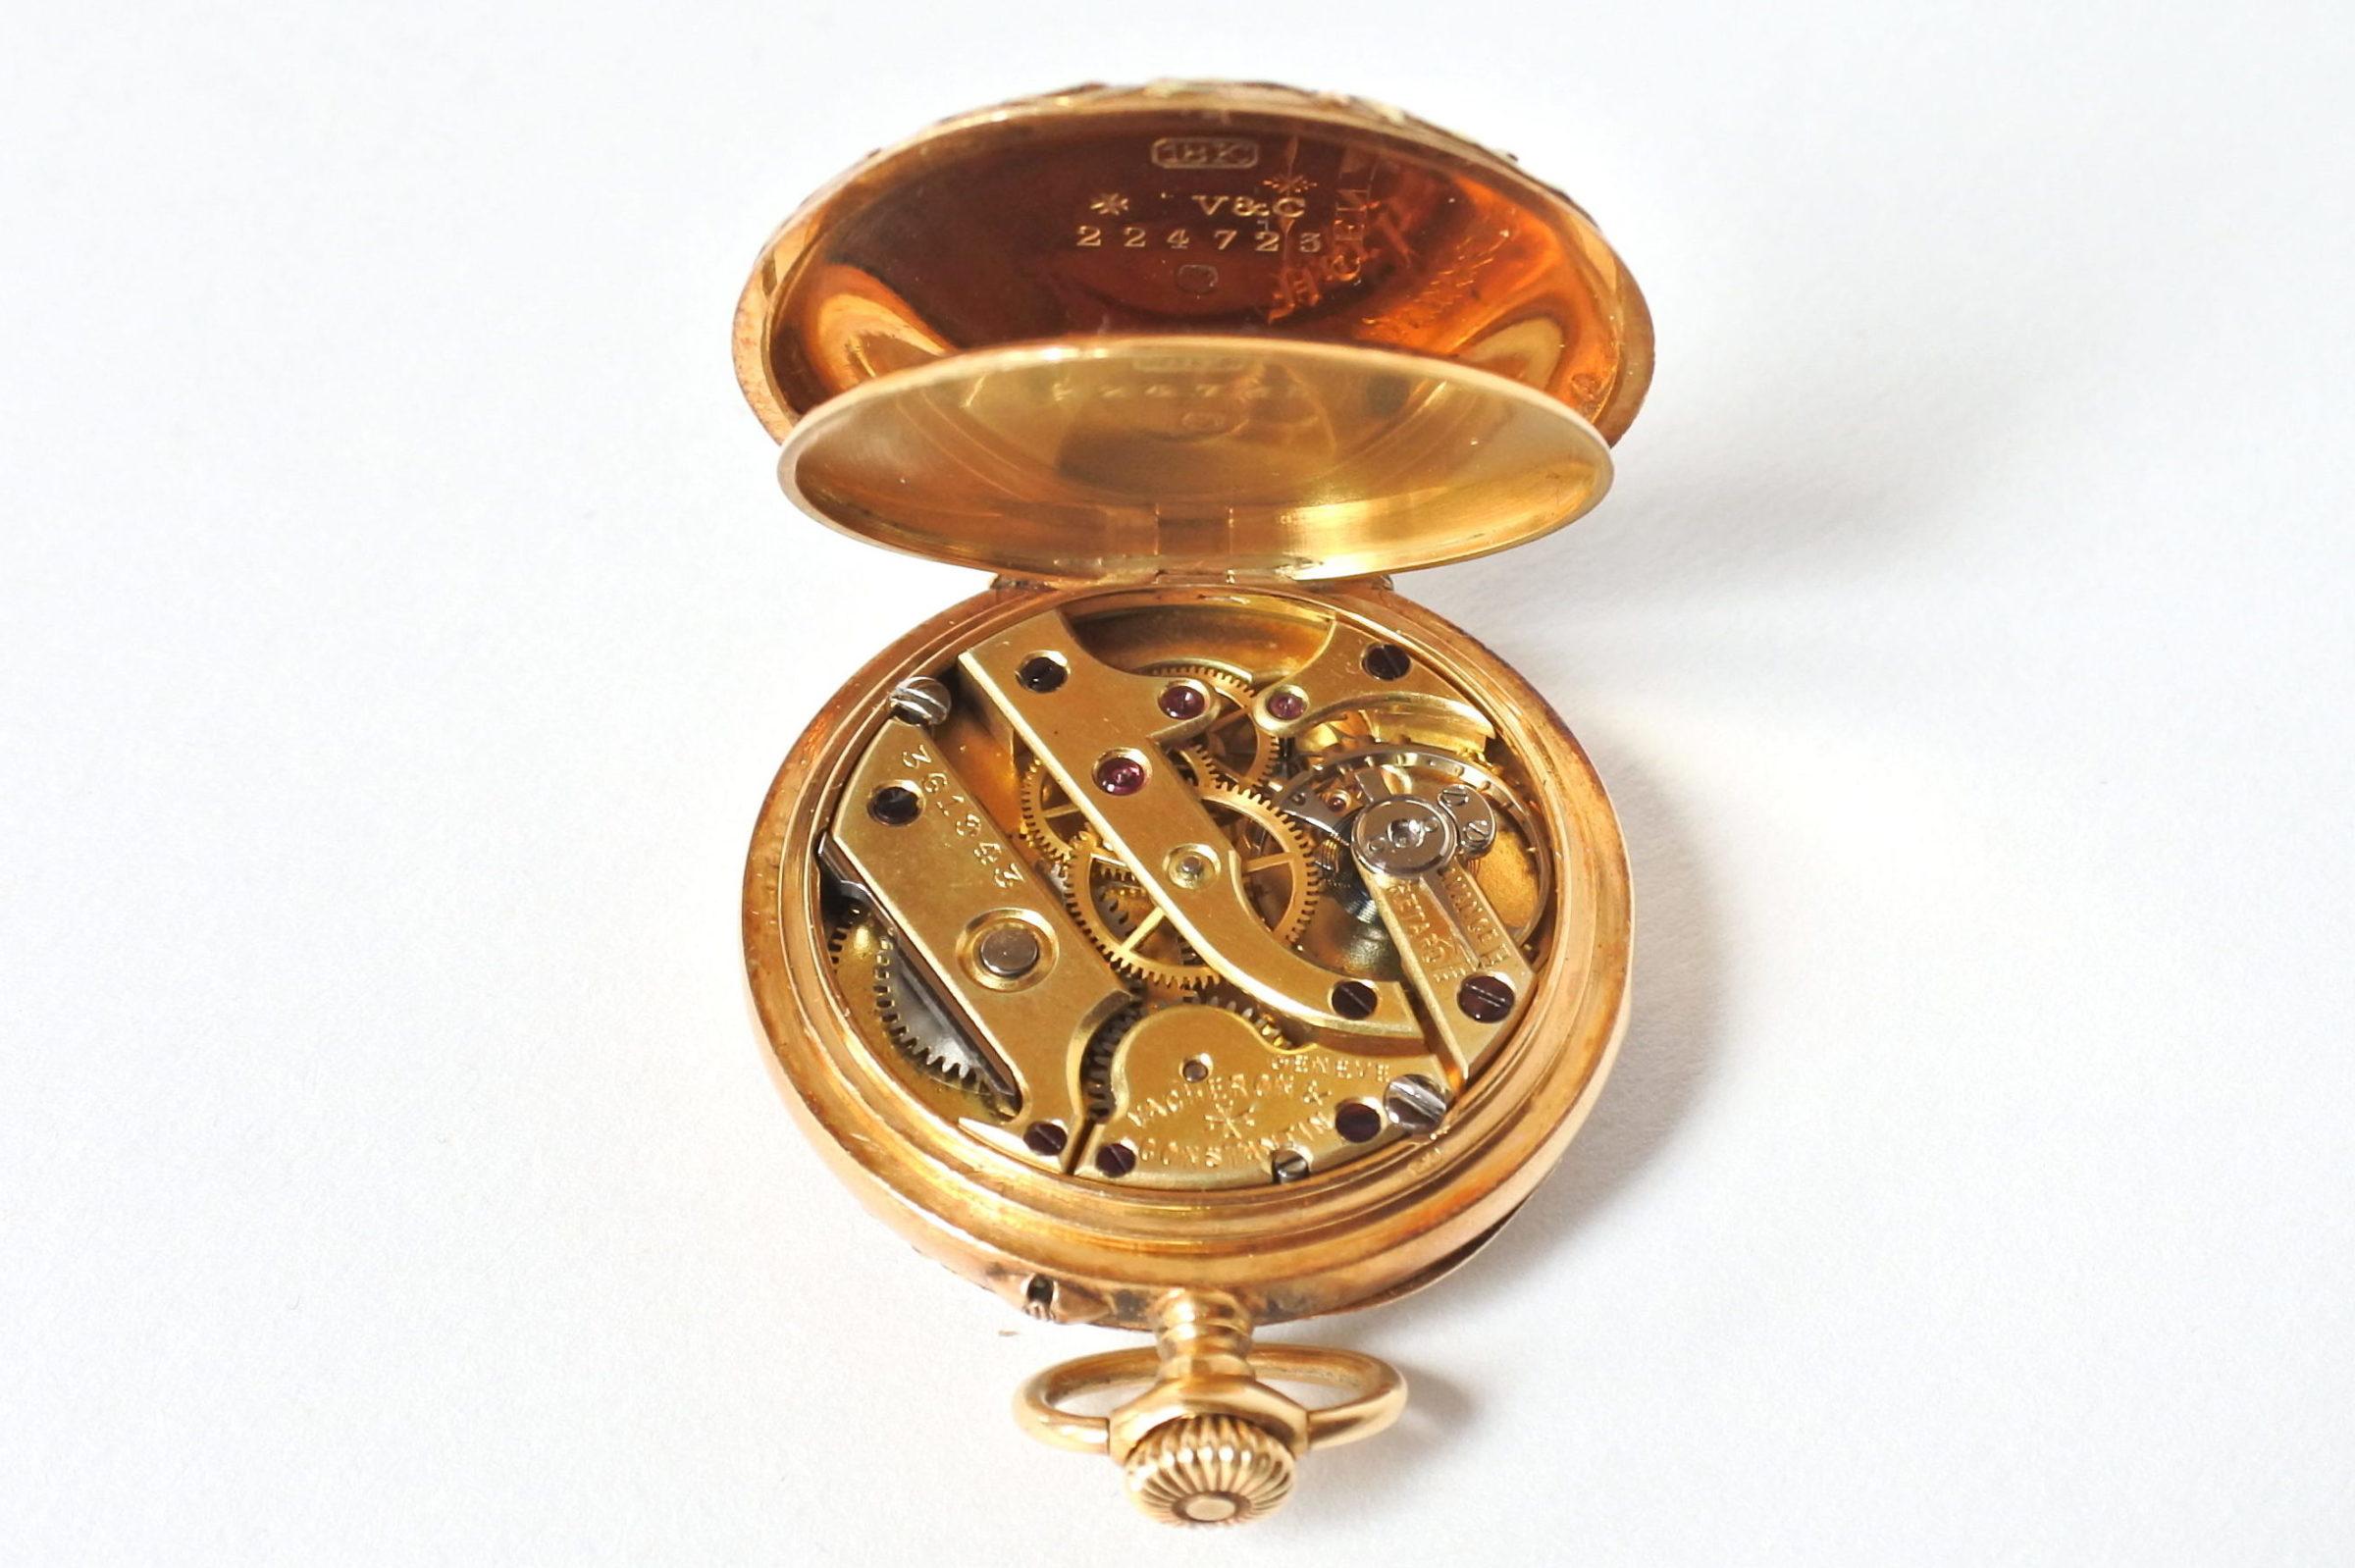 Monachina Vacheron Constantin in oro 18k - 10